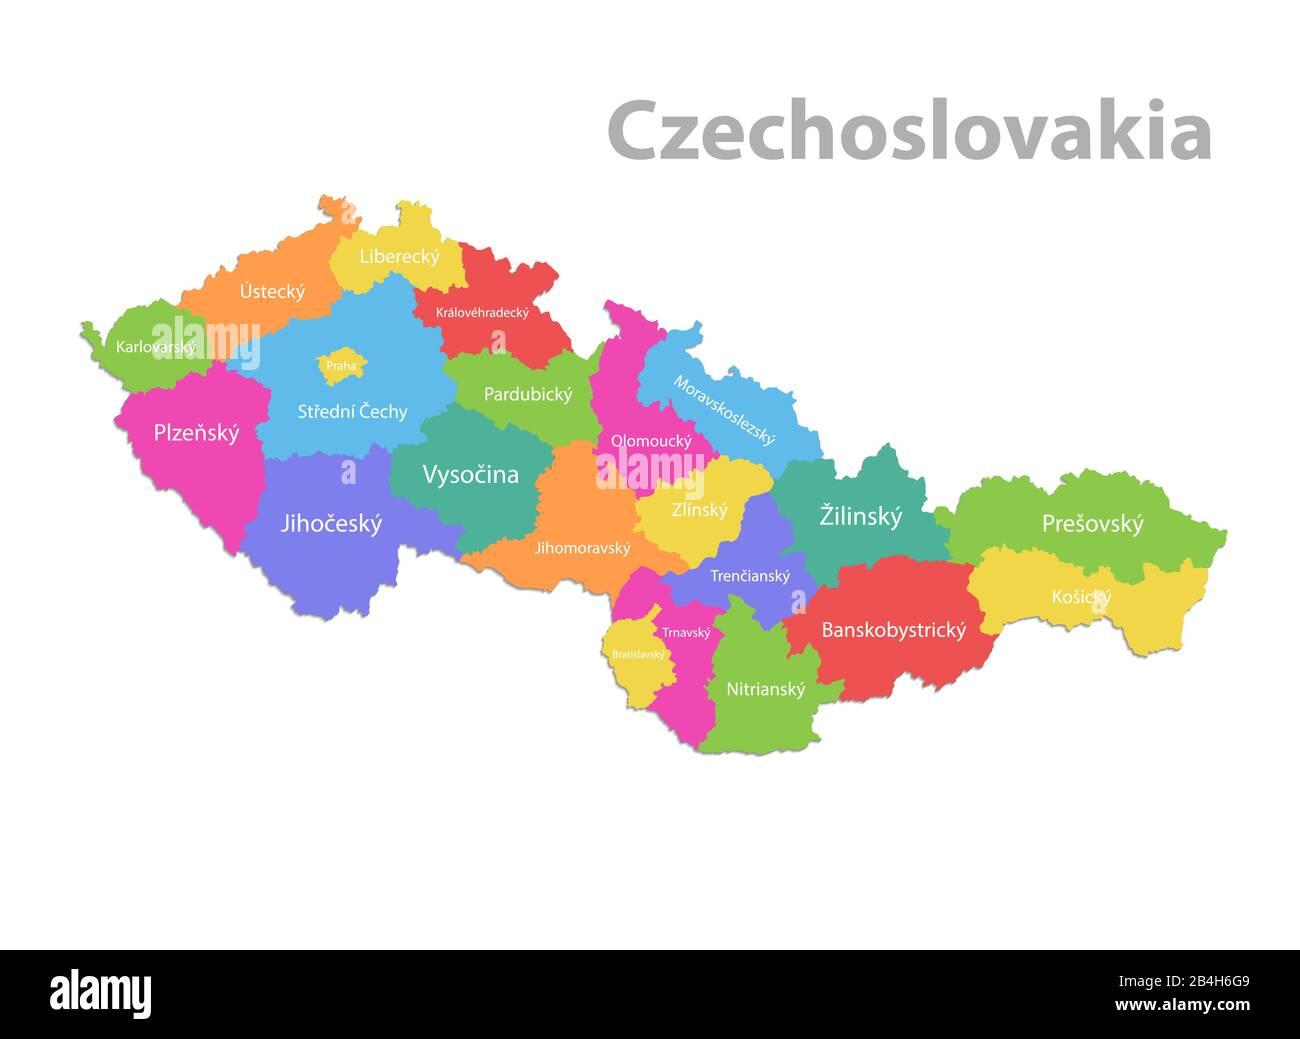 1914 10C Ottoman 12C Ferdinand I /&c 1920 map CZECHOSLOVAKIA HISTORICAL BORDERS